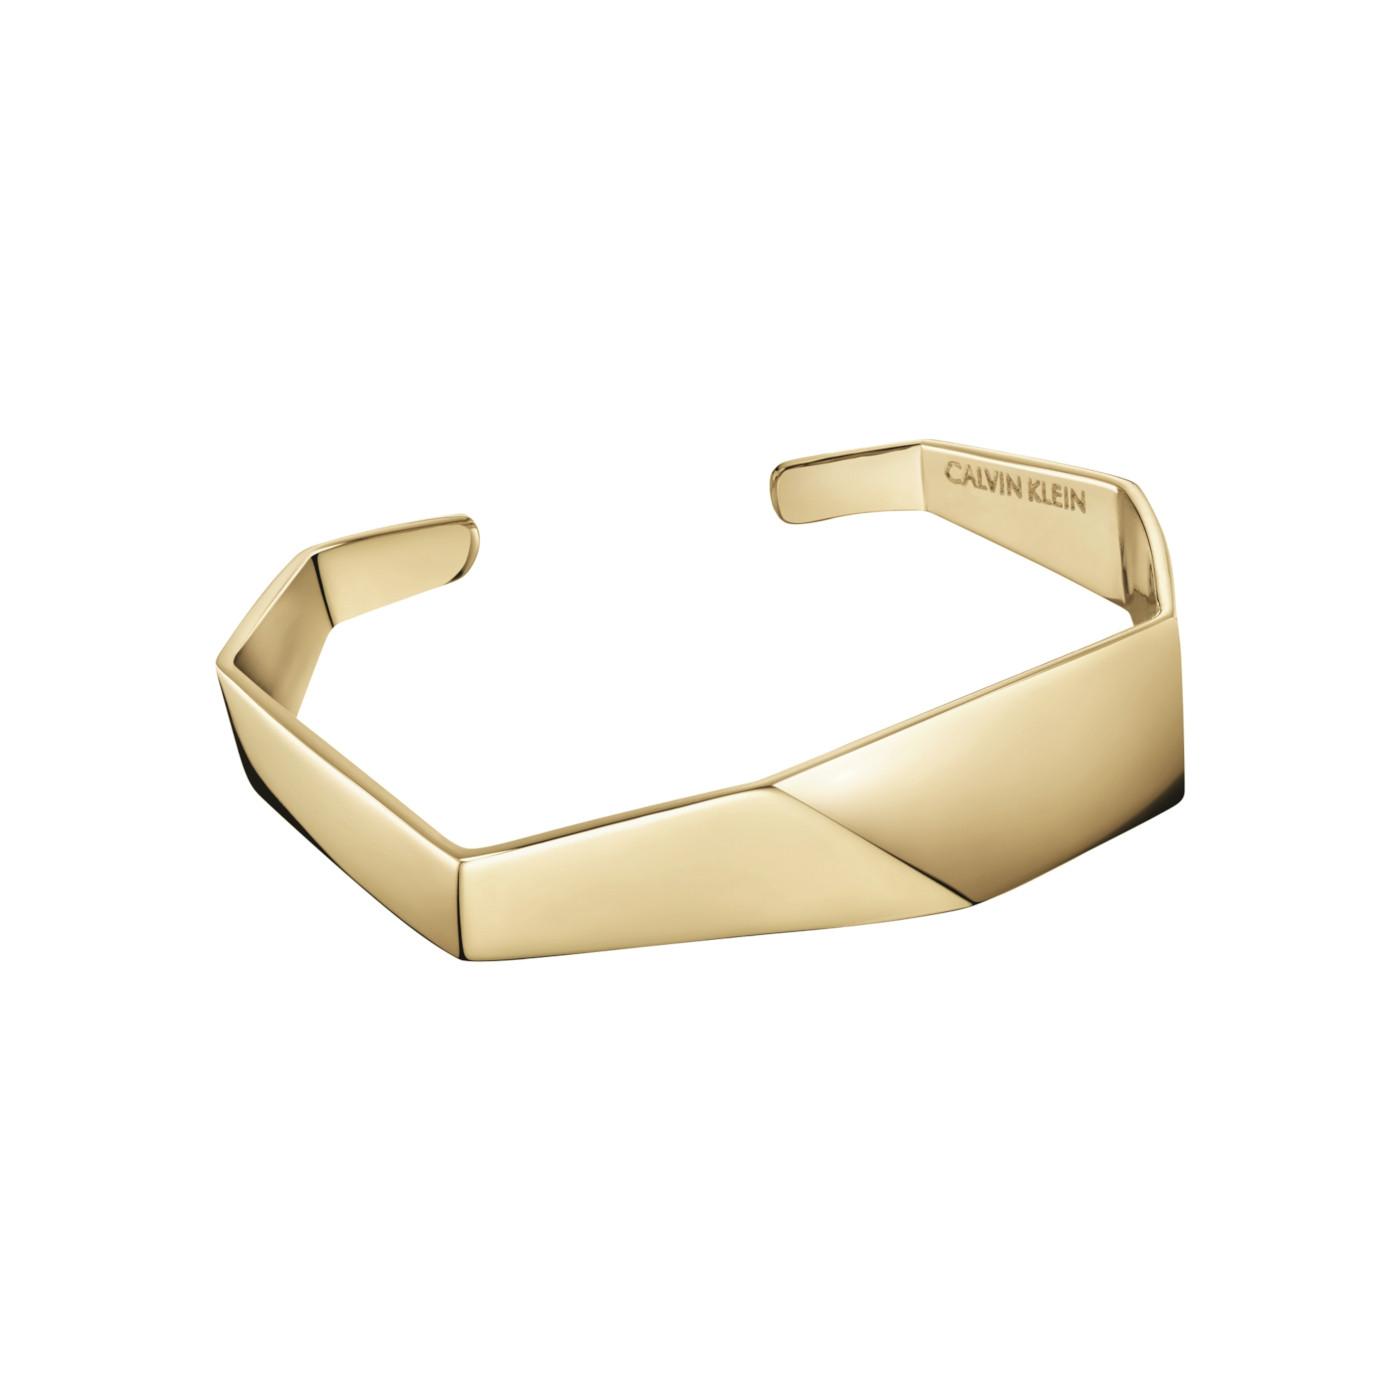 Calvin Klein Juwelen - ORIGAMI BANGLE KJATJF10010